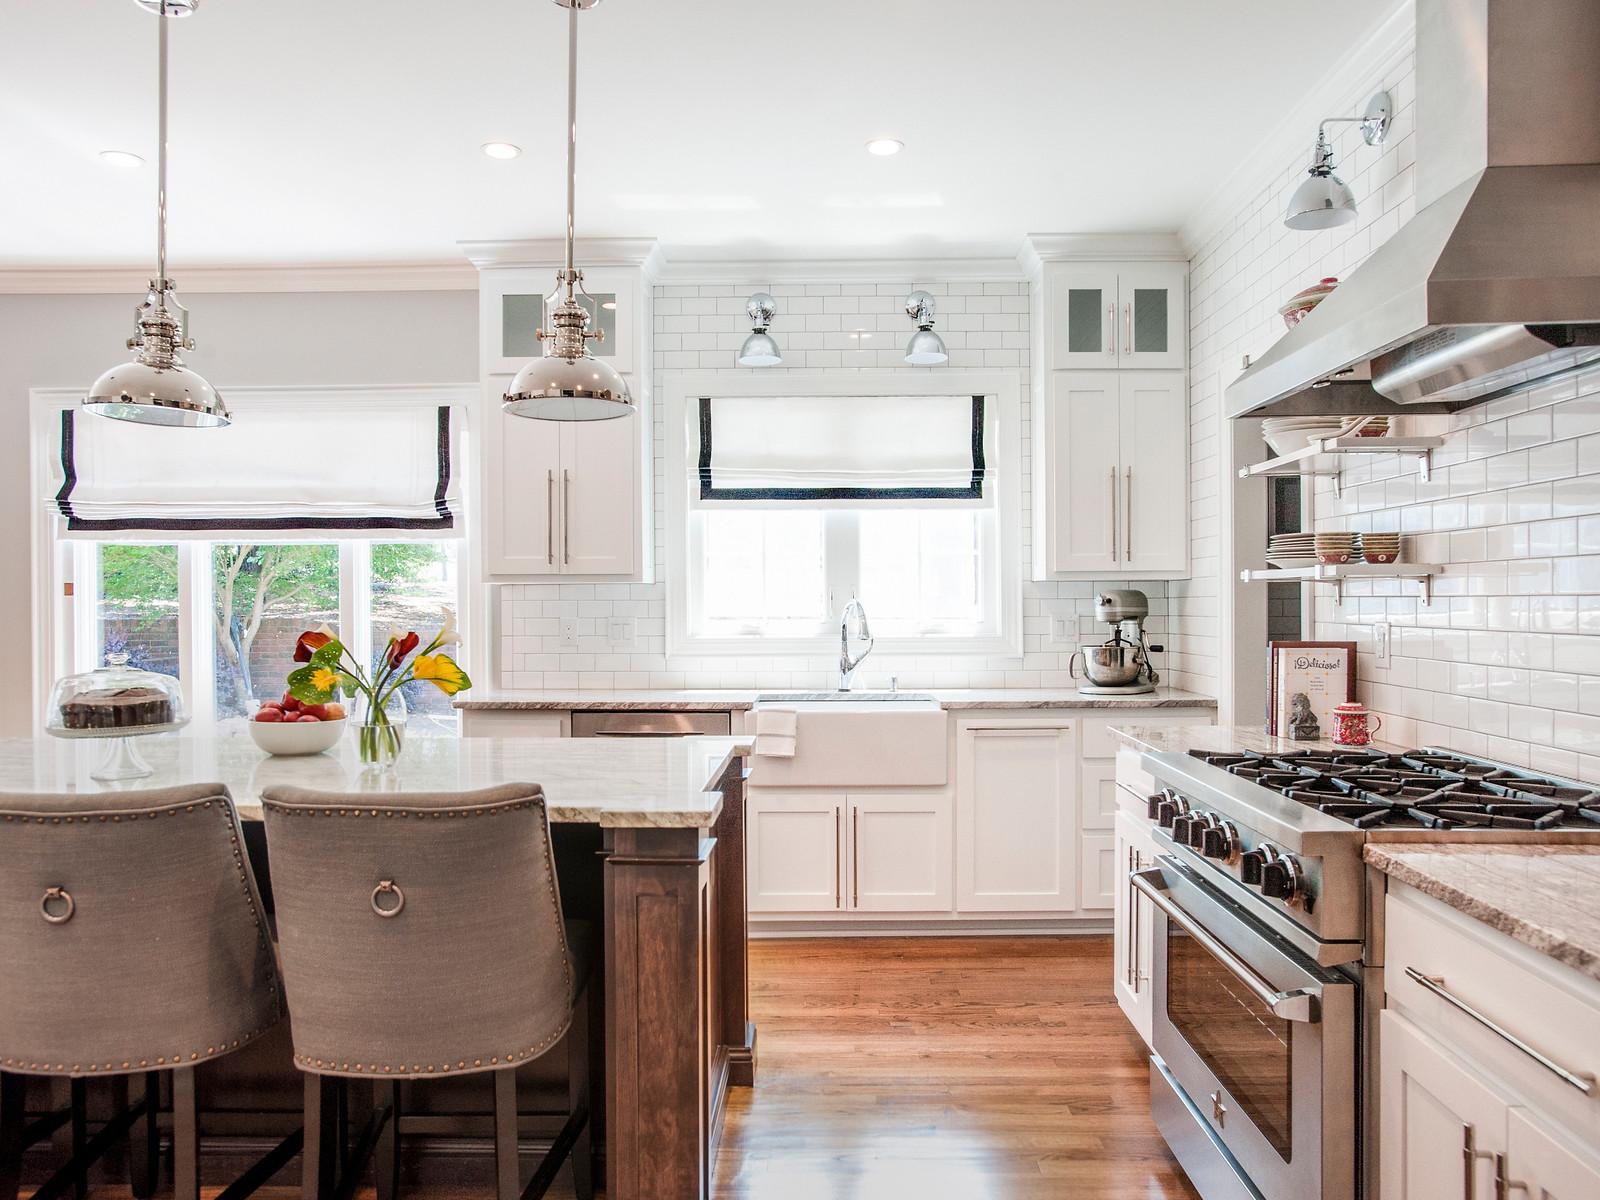 Jana Donohoe Designs Kitchen Design Fayetteville,North Carolina.jpg